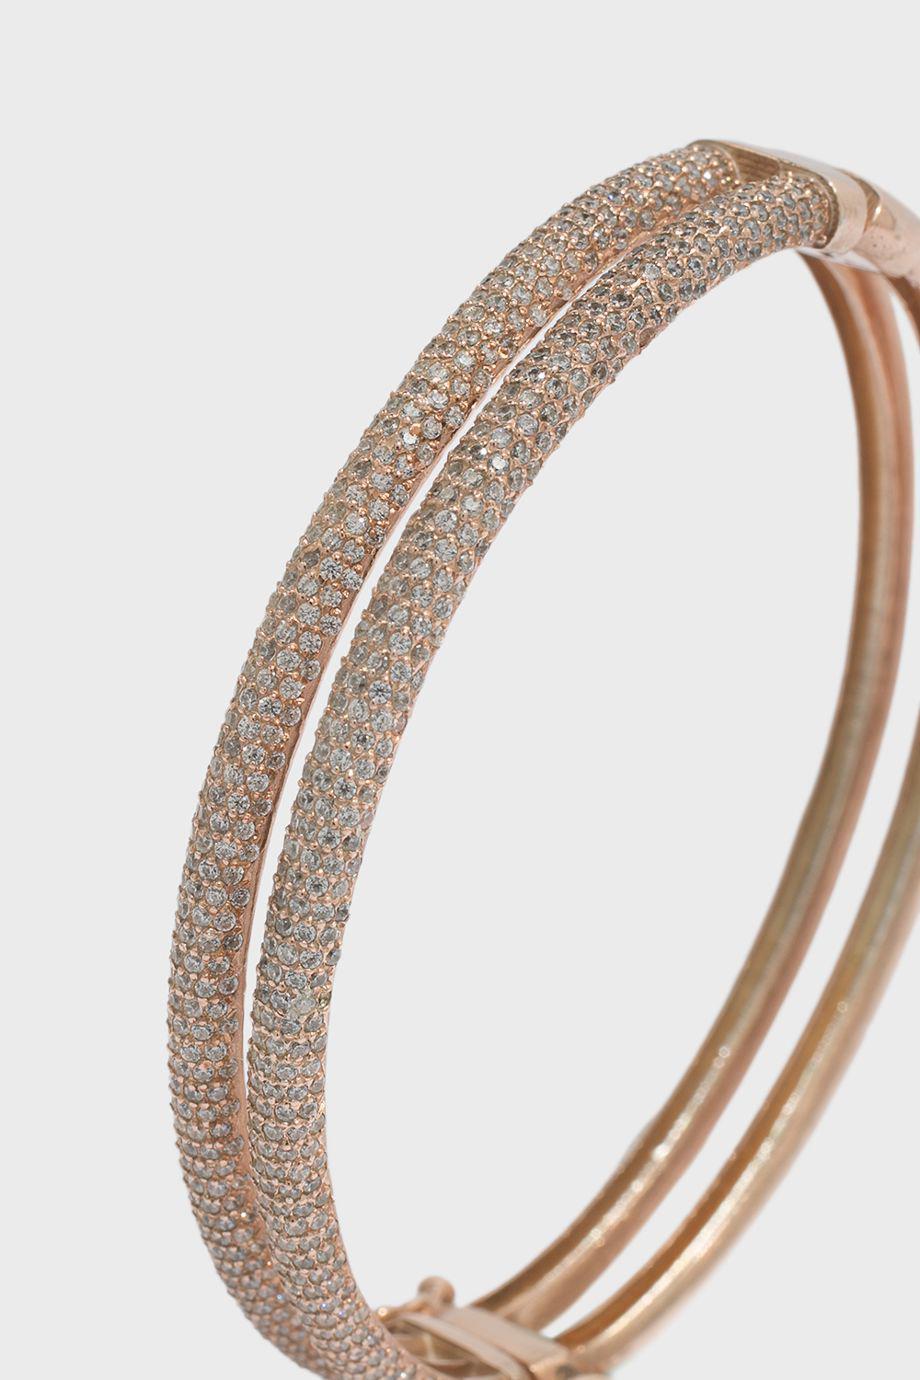 Maha Lozi Wave encrusted bracelet - Metallic 87P0s8hIw